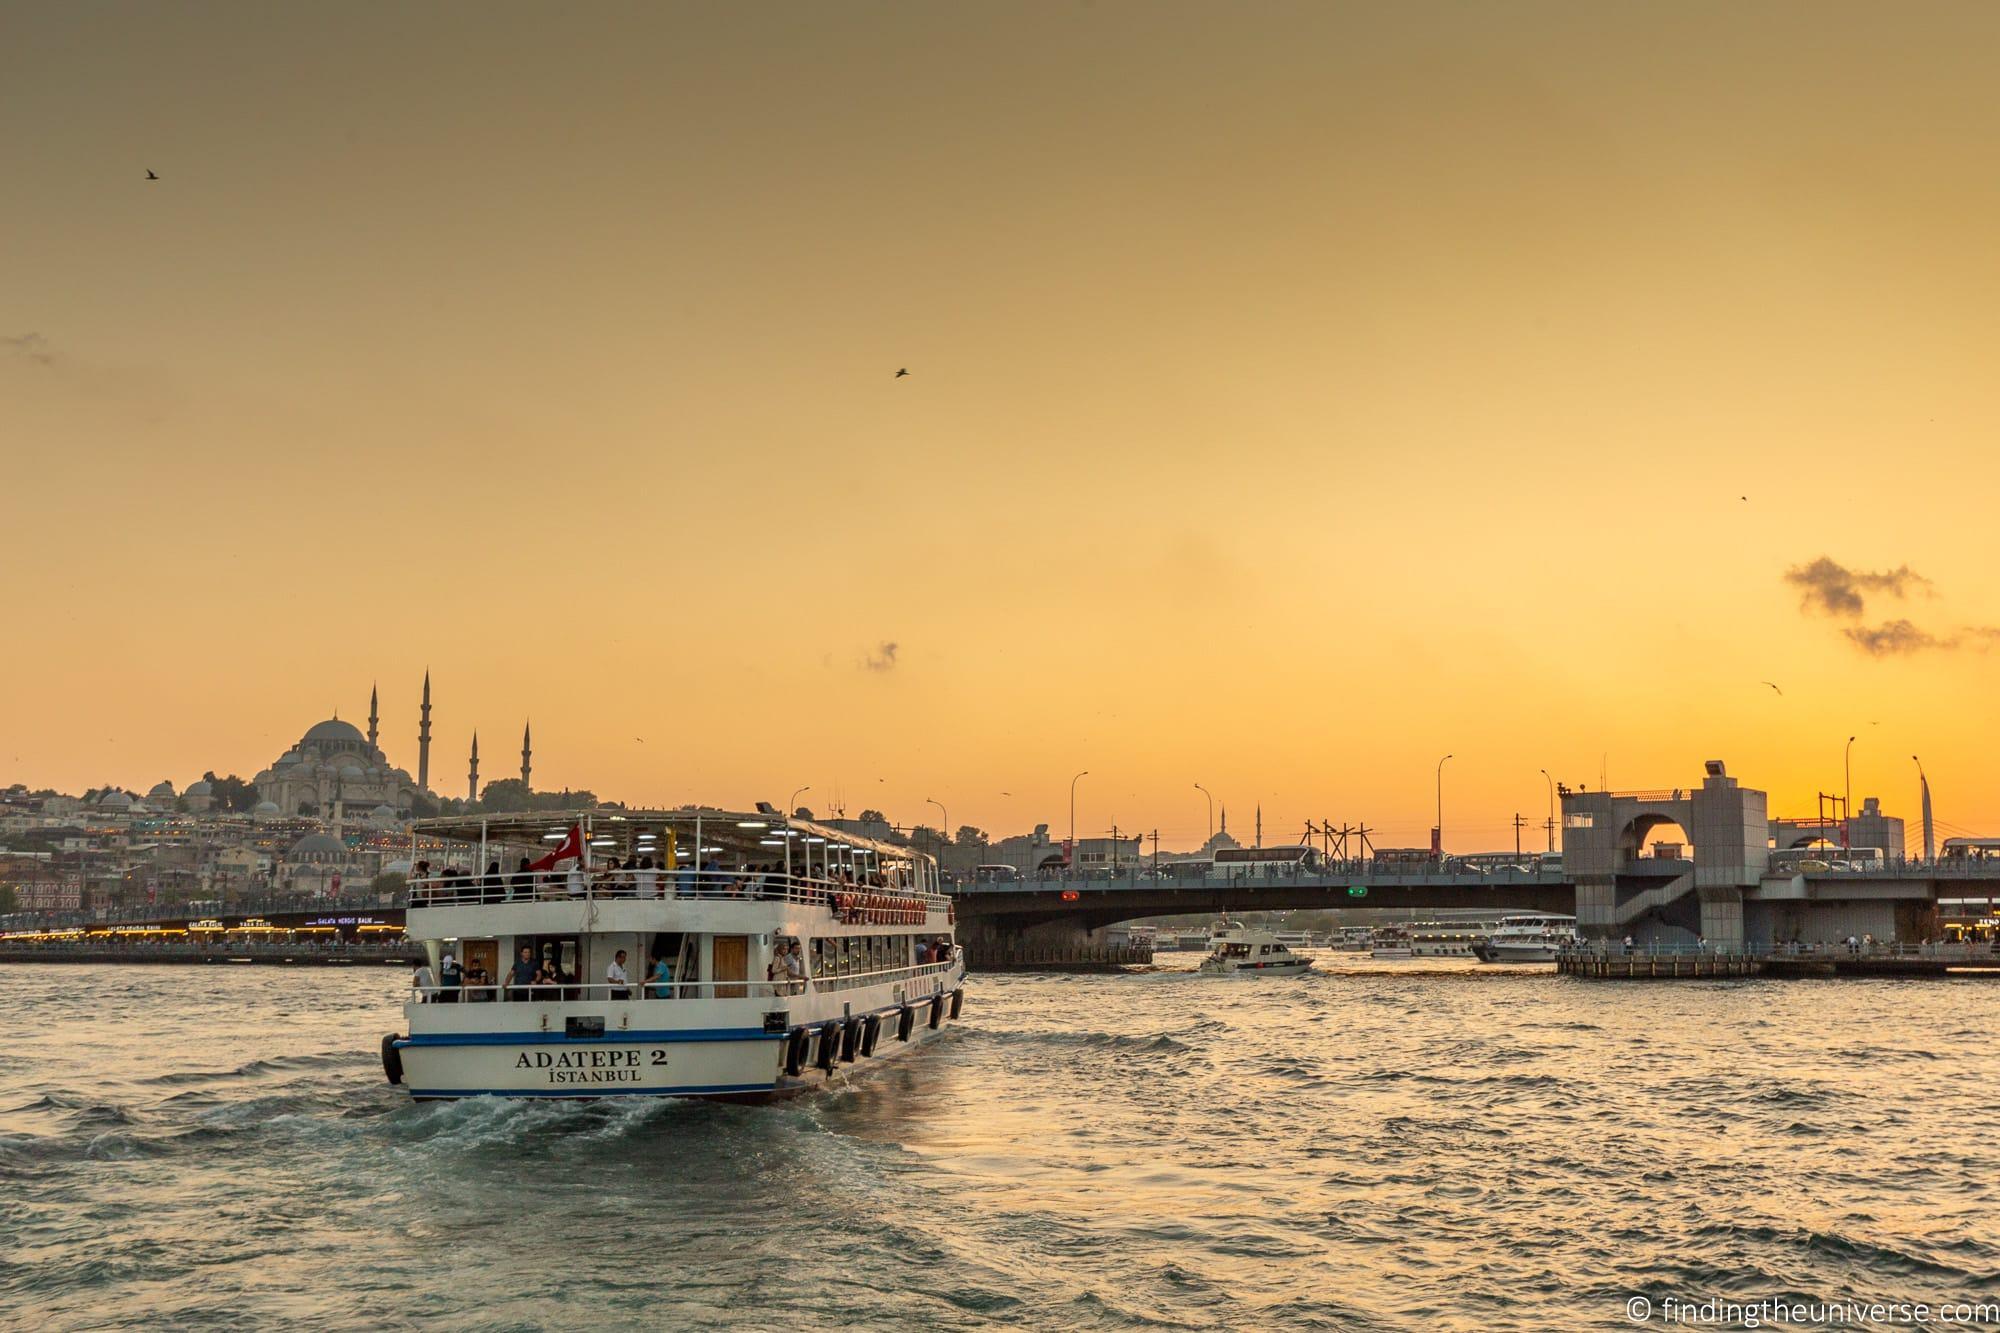 sunset cruise on the Bosphorus